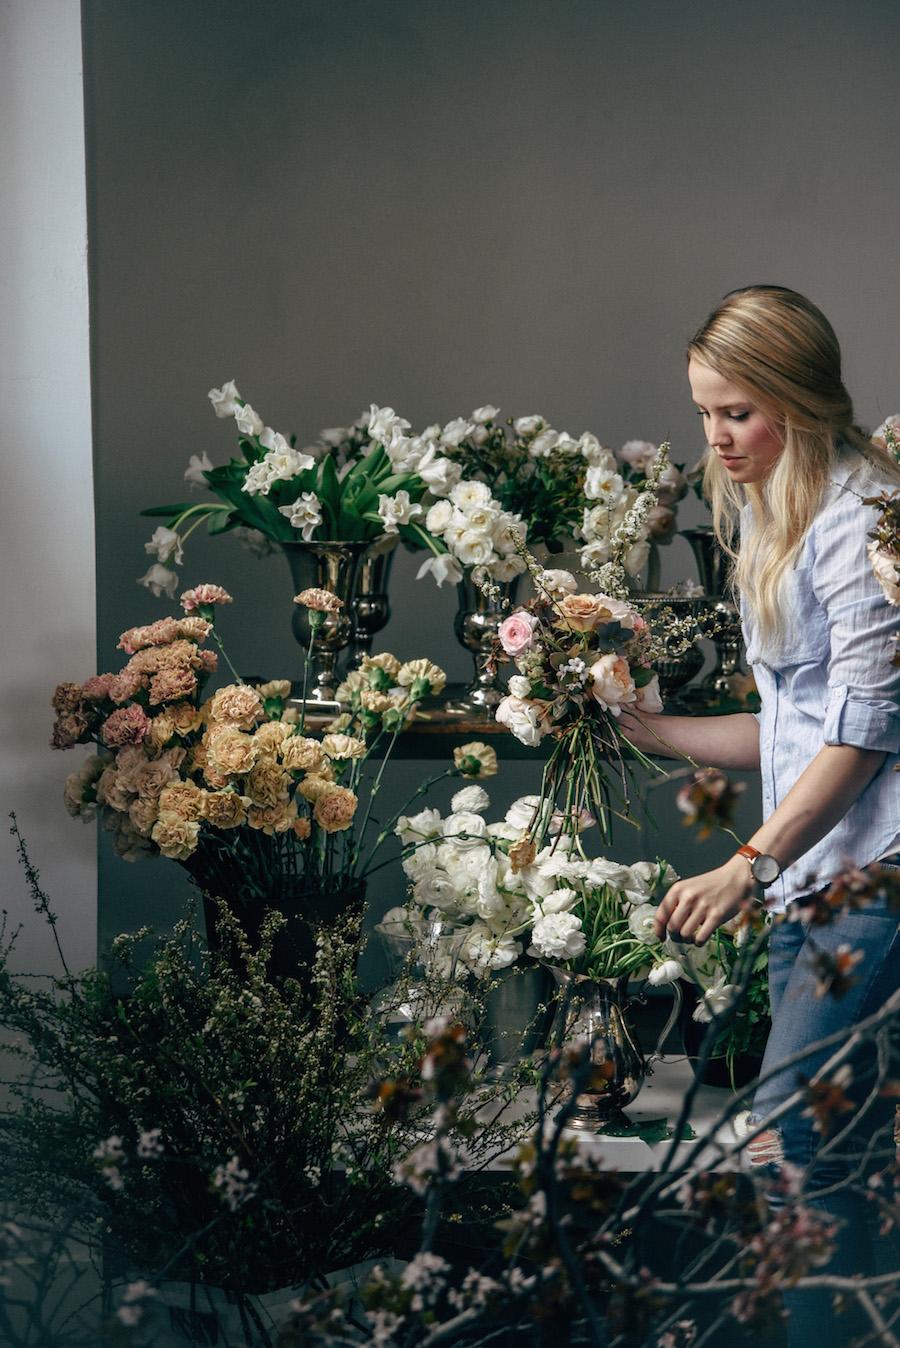 Nicole Land of Soil & Stem preparing for her Spring Floral Design Workshop for flower artists now featured on Cottage Hill